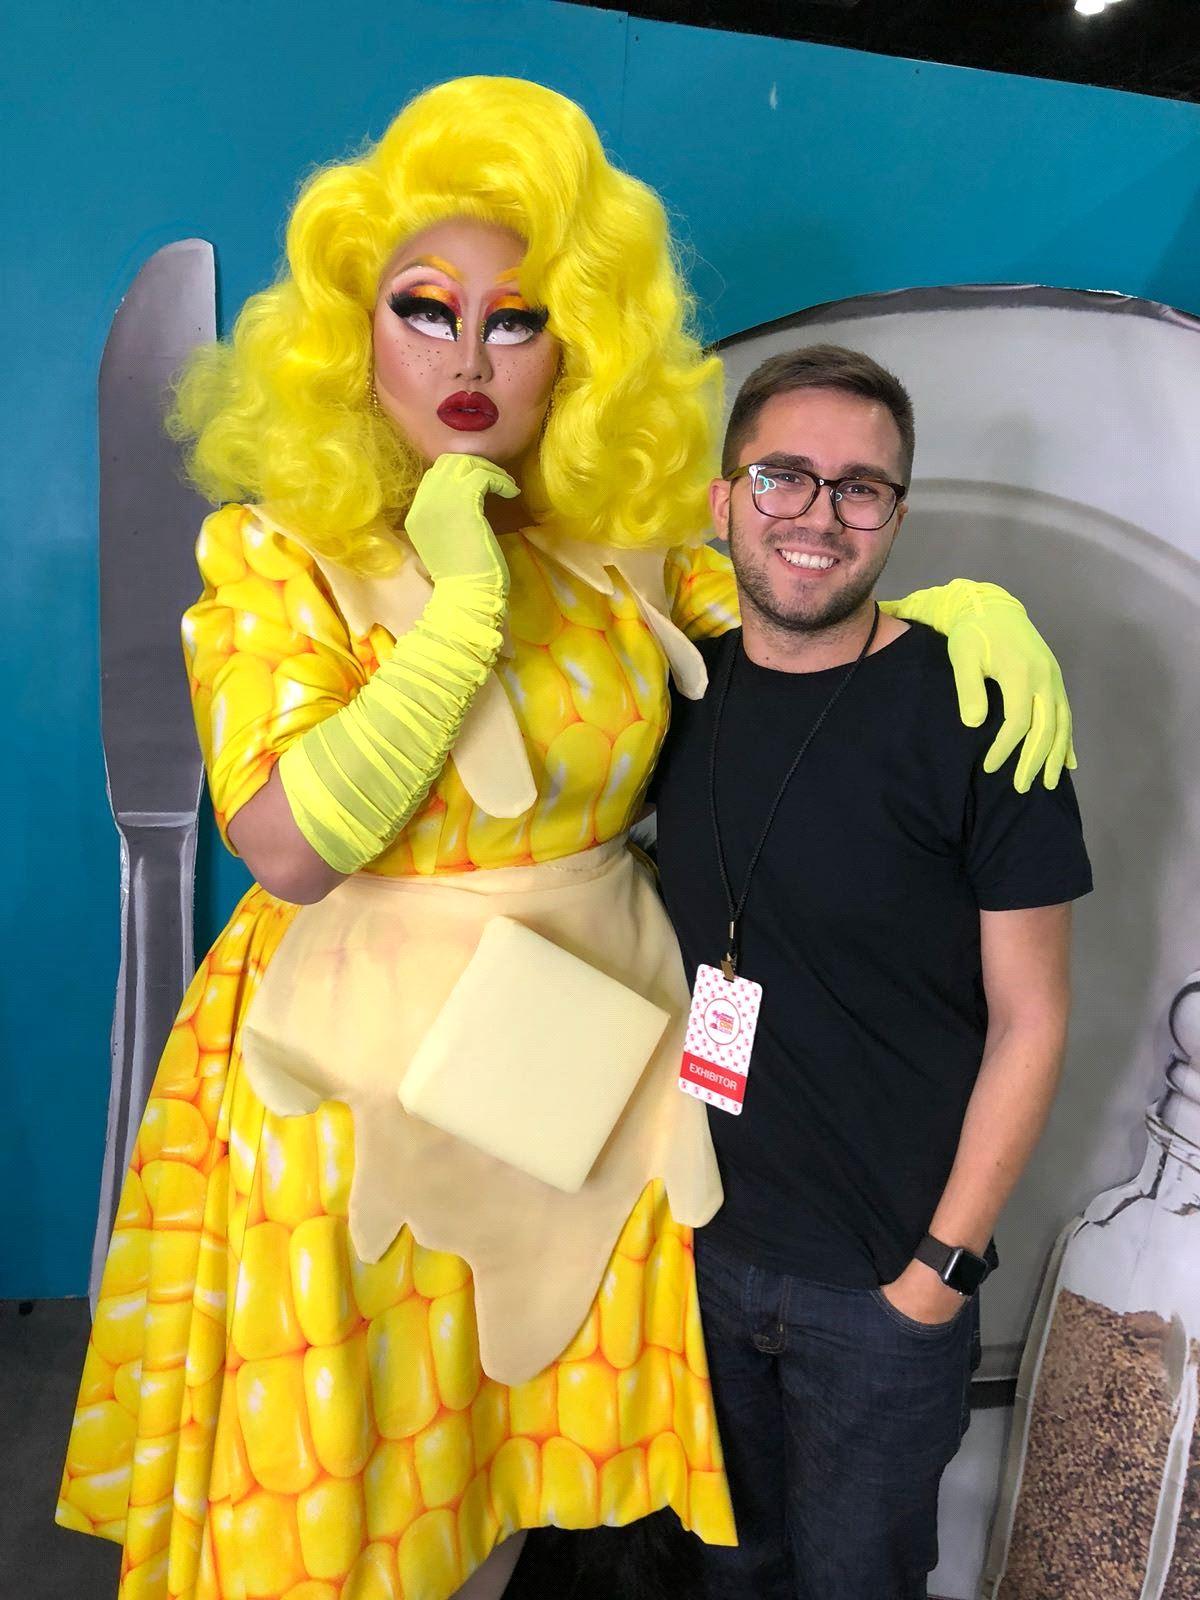 Facetune Designer Judah Guttmann and Kim Chi at RuPaul's DragCon LA 2018 (courtesy Lightricks)